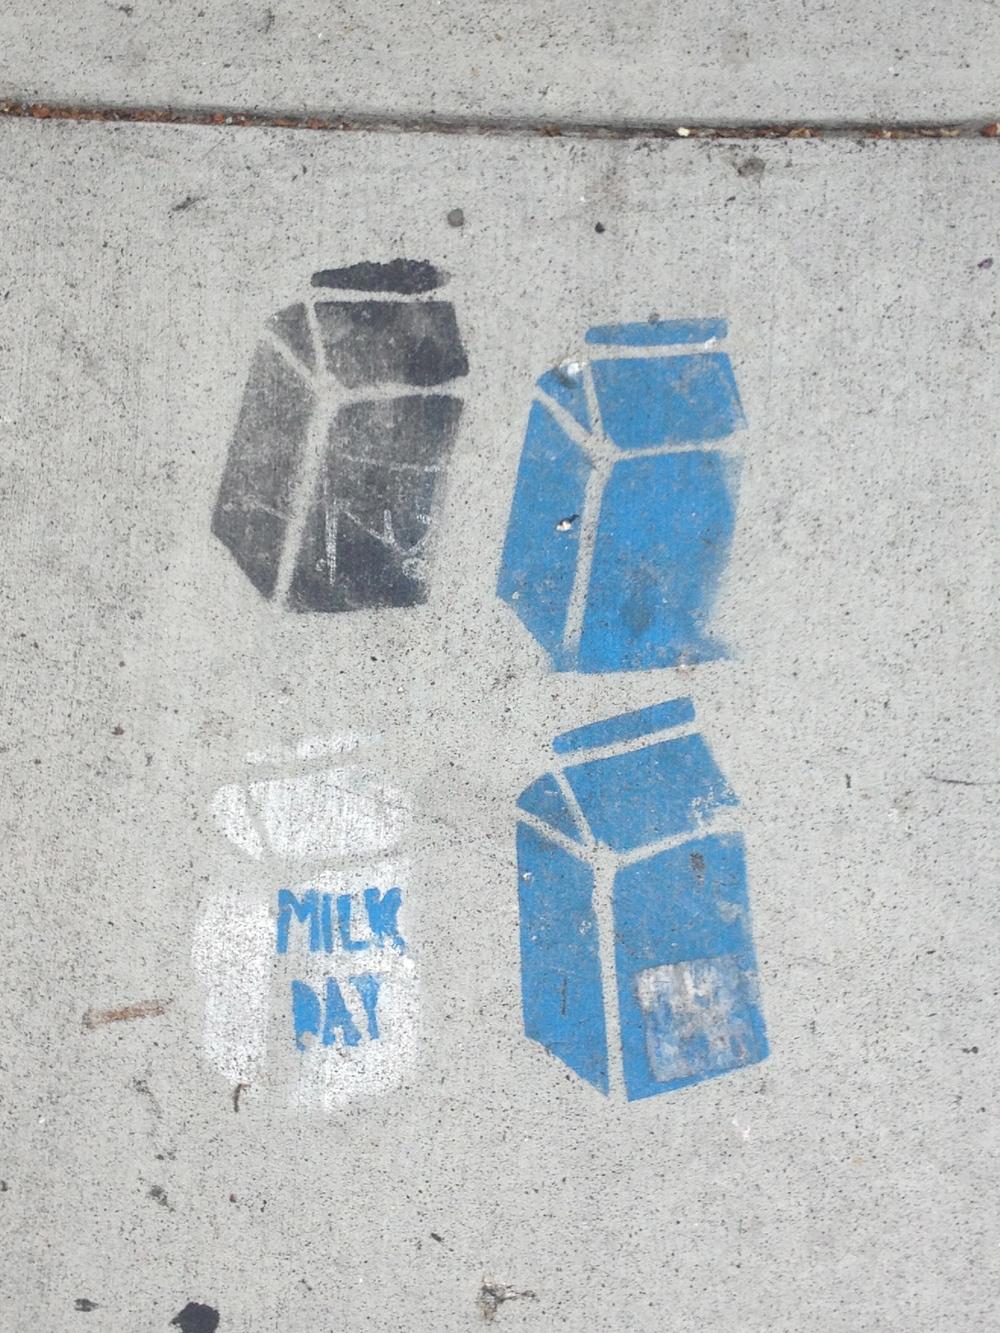 Valencia Street sidewalk art